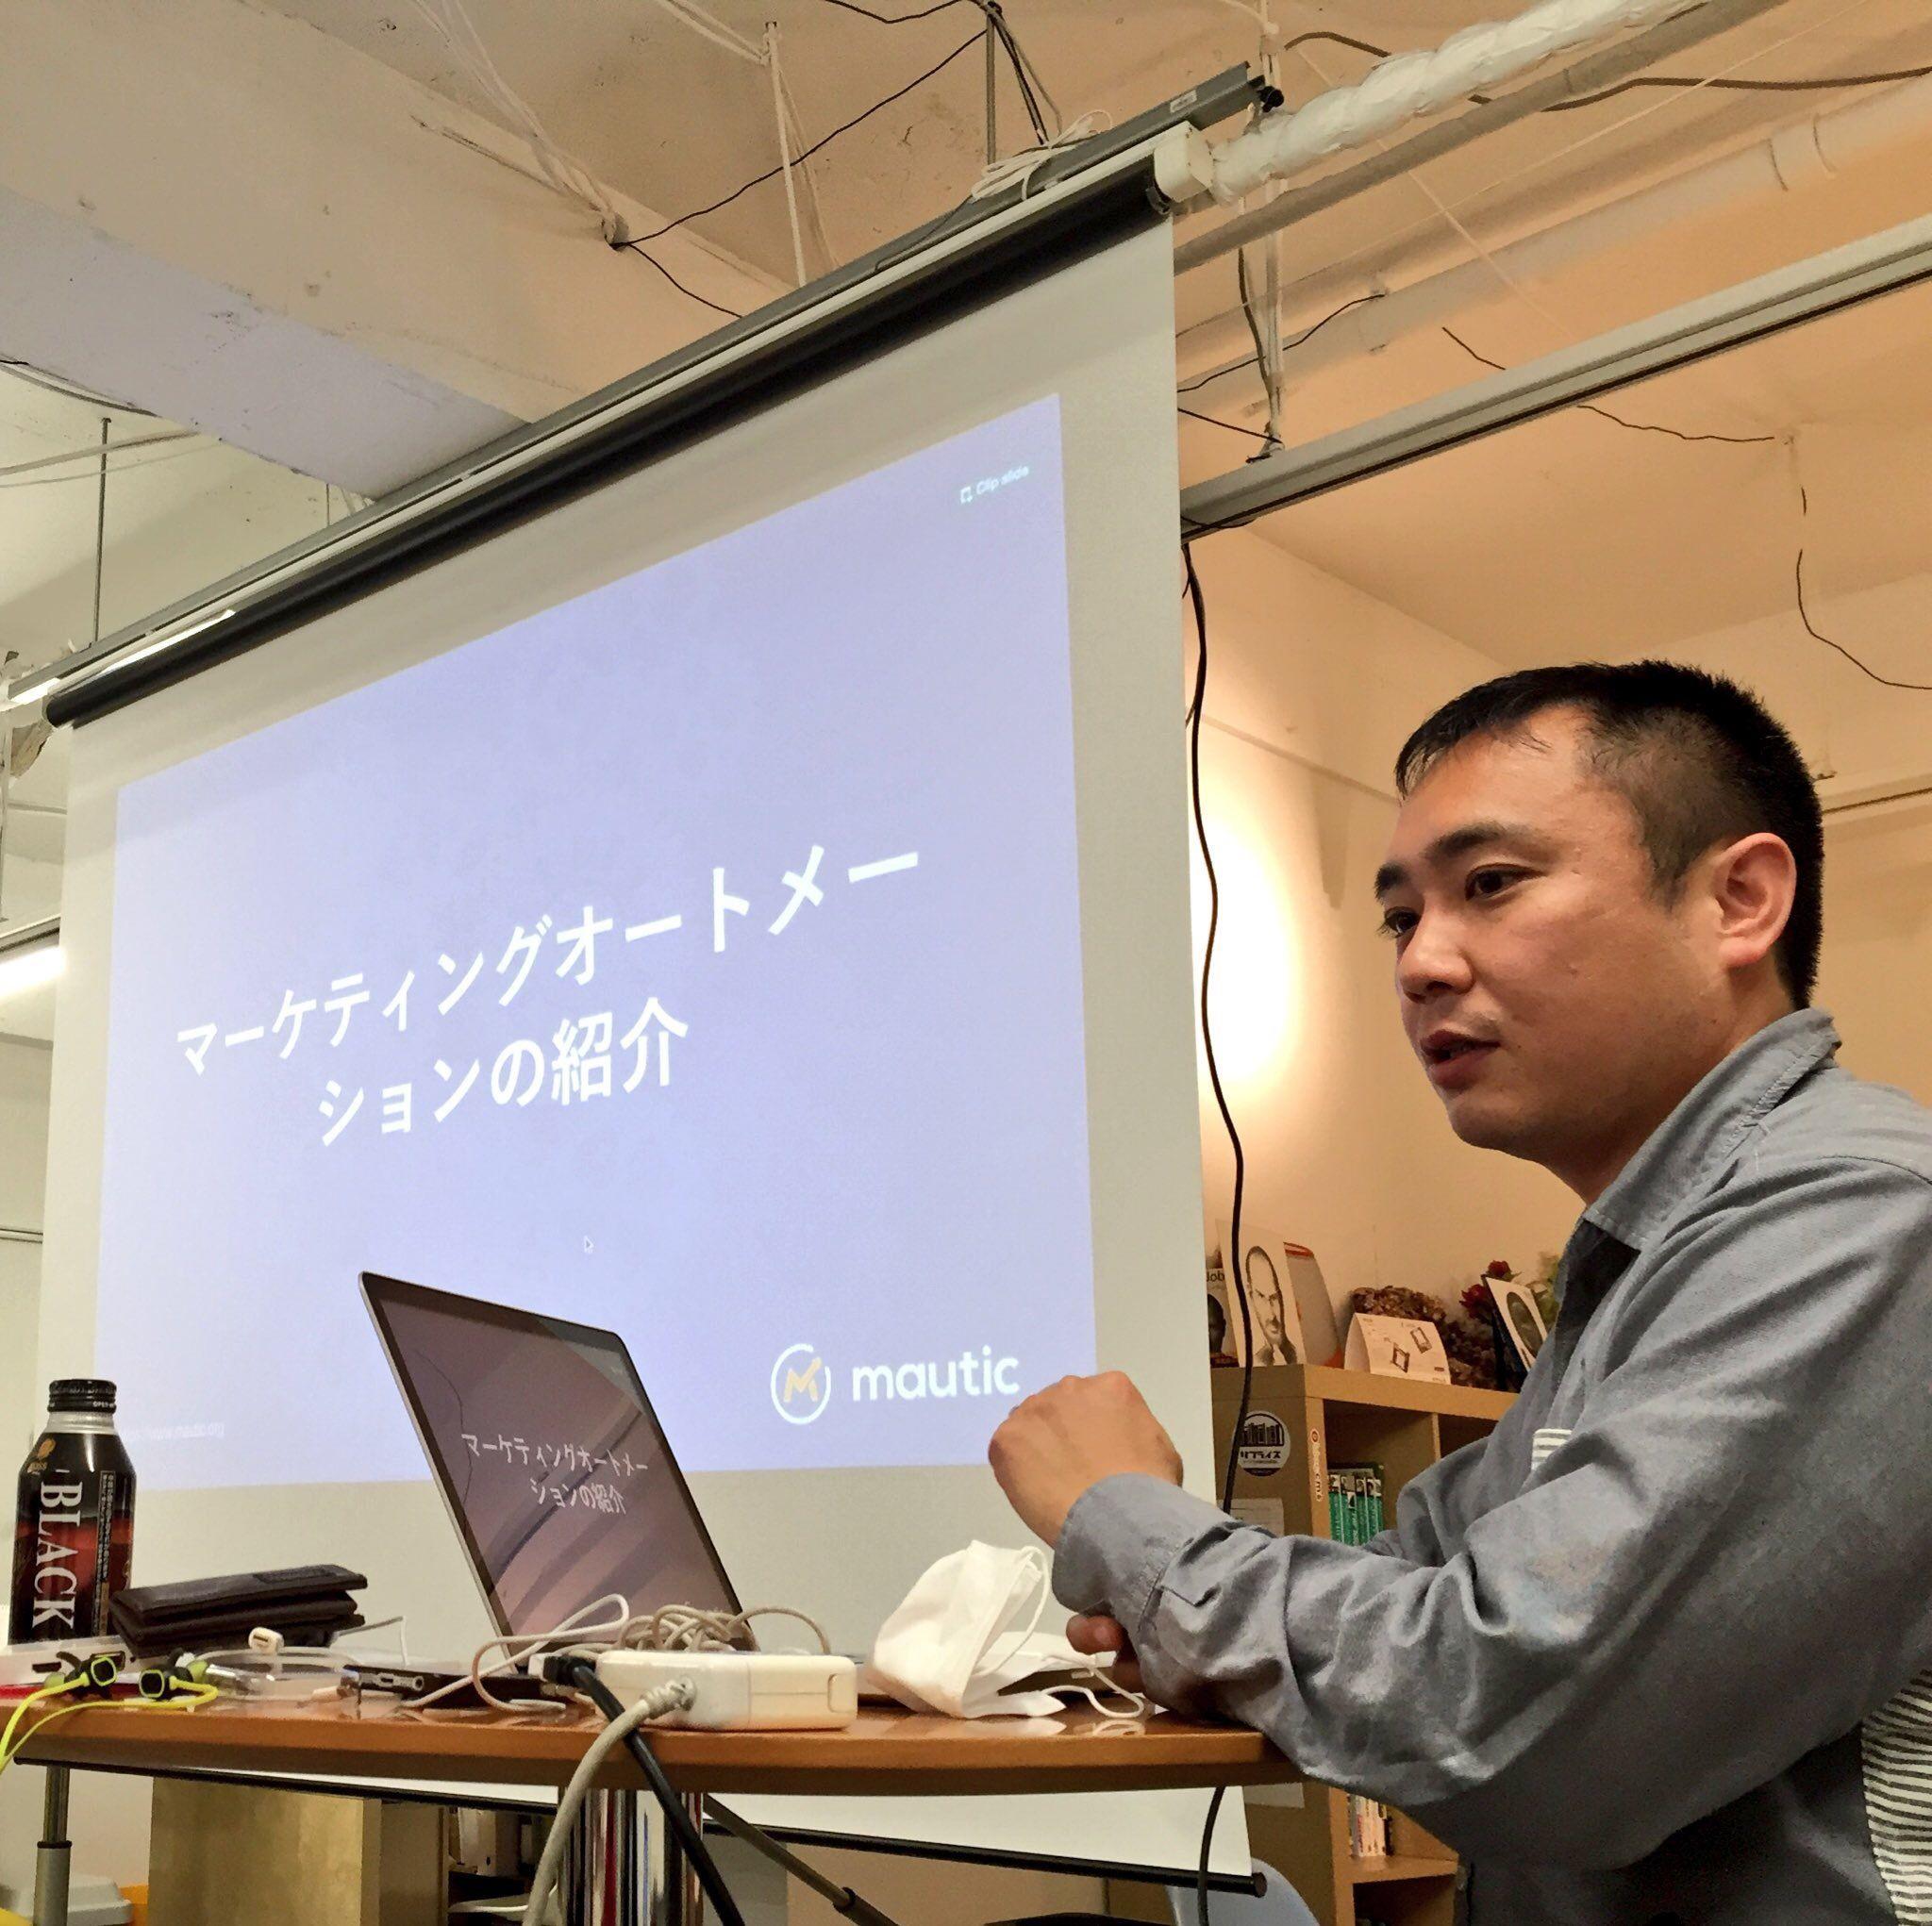 Webマーケティング勉強会 Nagoya